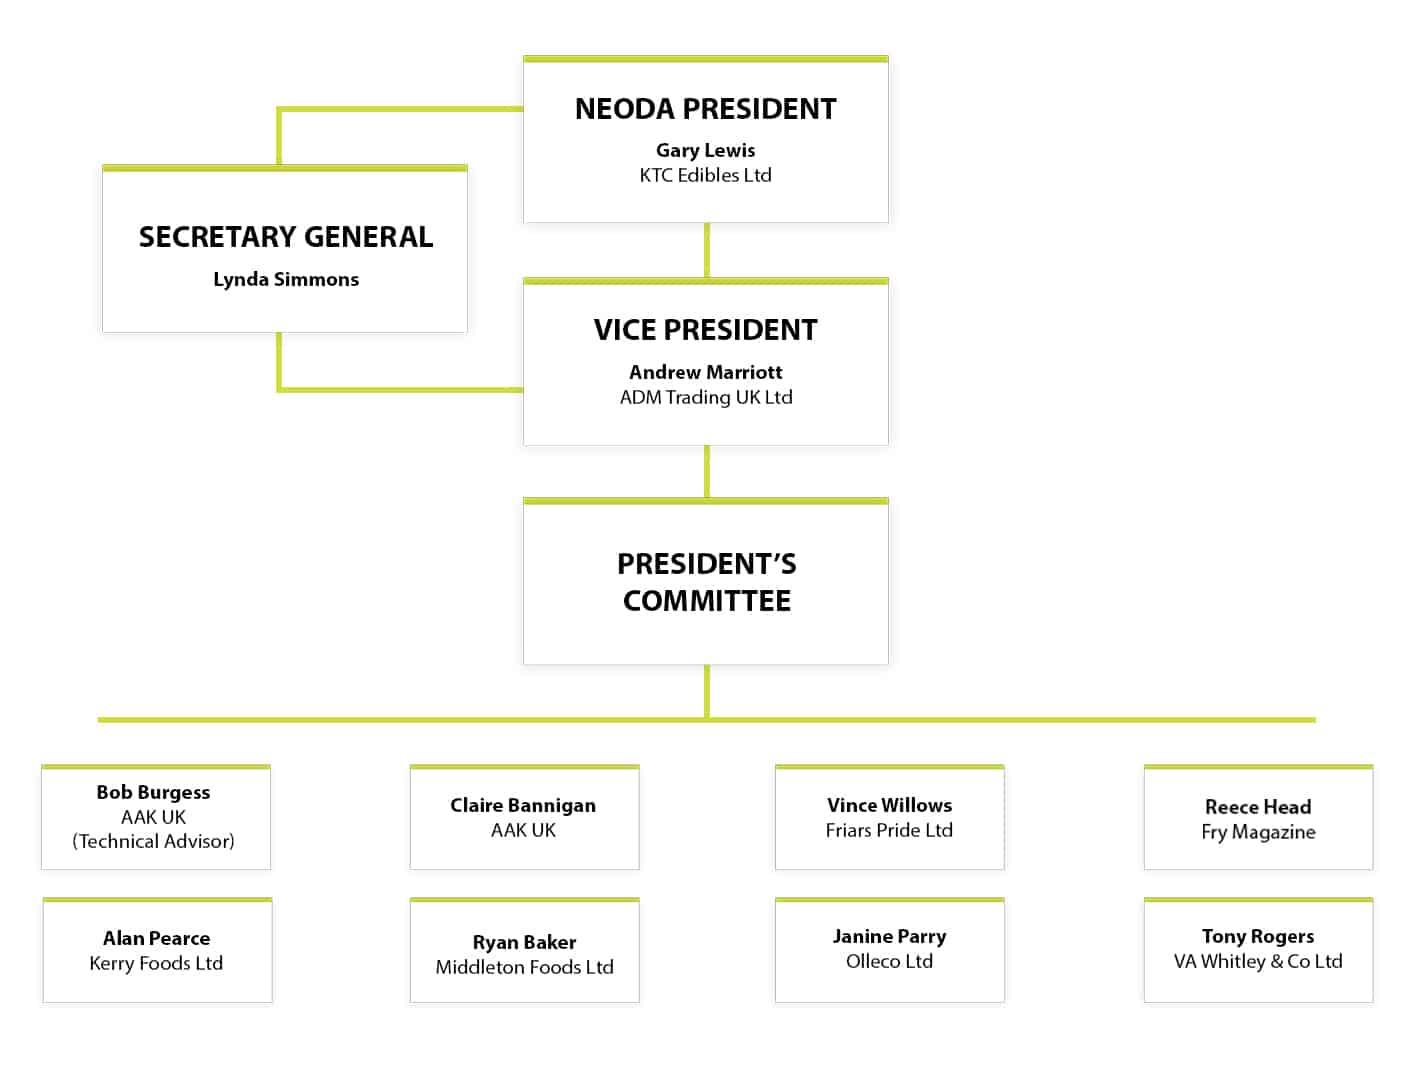 NEODA PRESIDENT'S COMMITTEE 2021